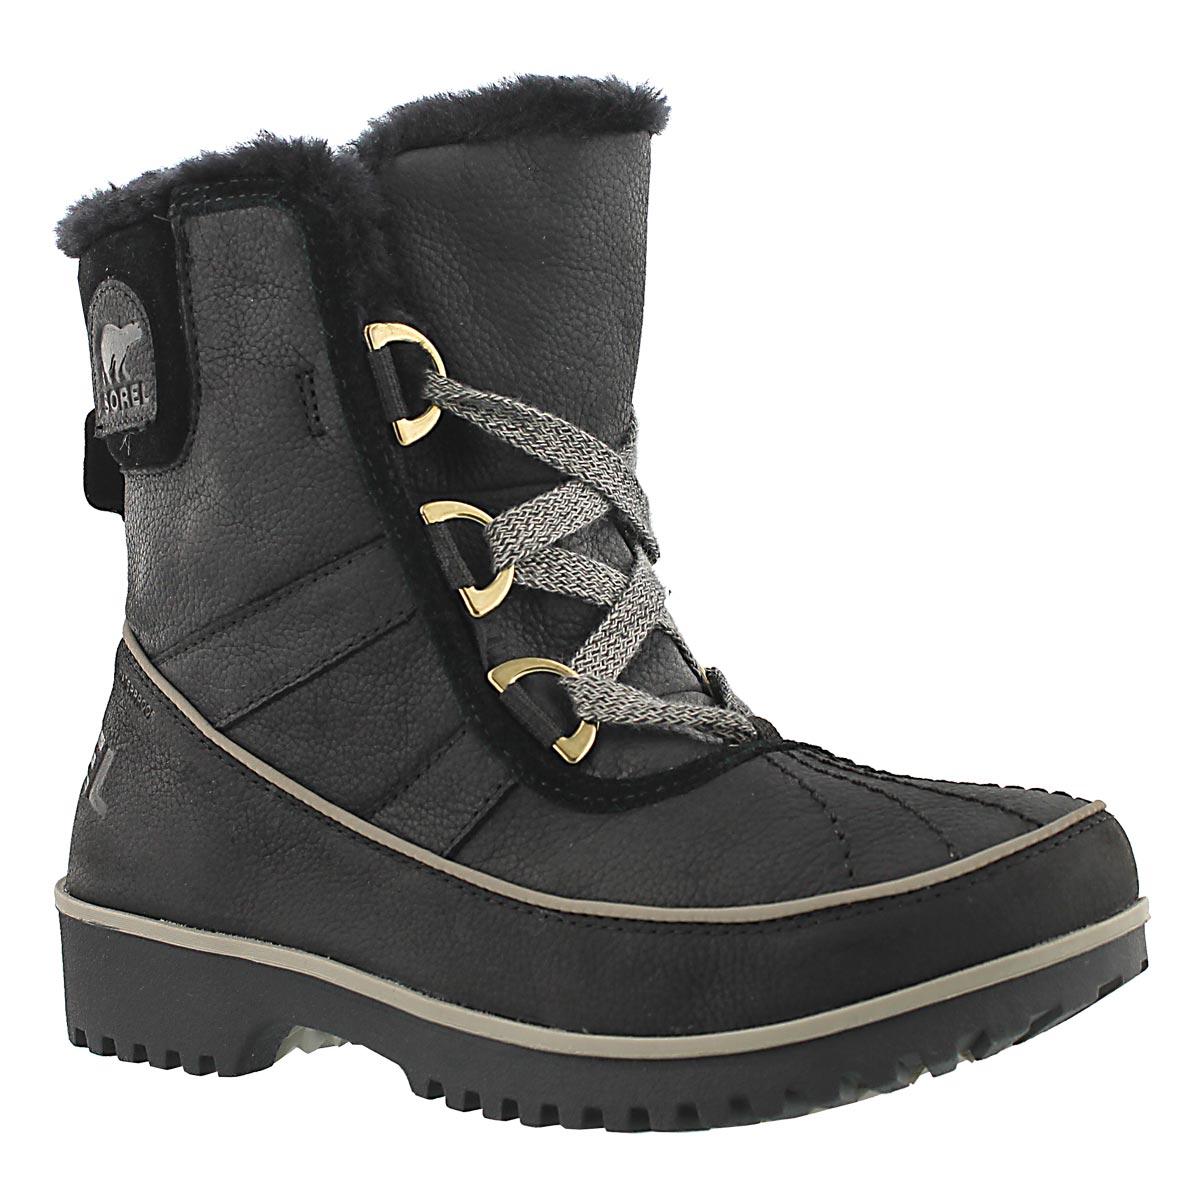 Women's TIVOLI II PREMIUM black winter boots